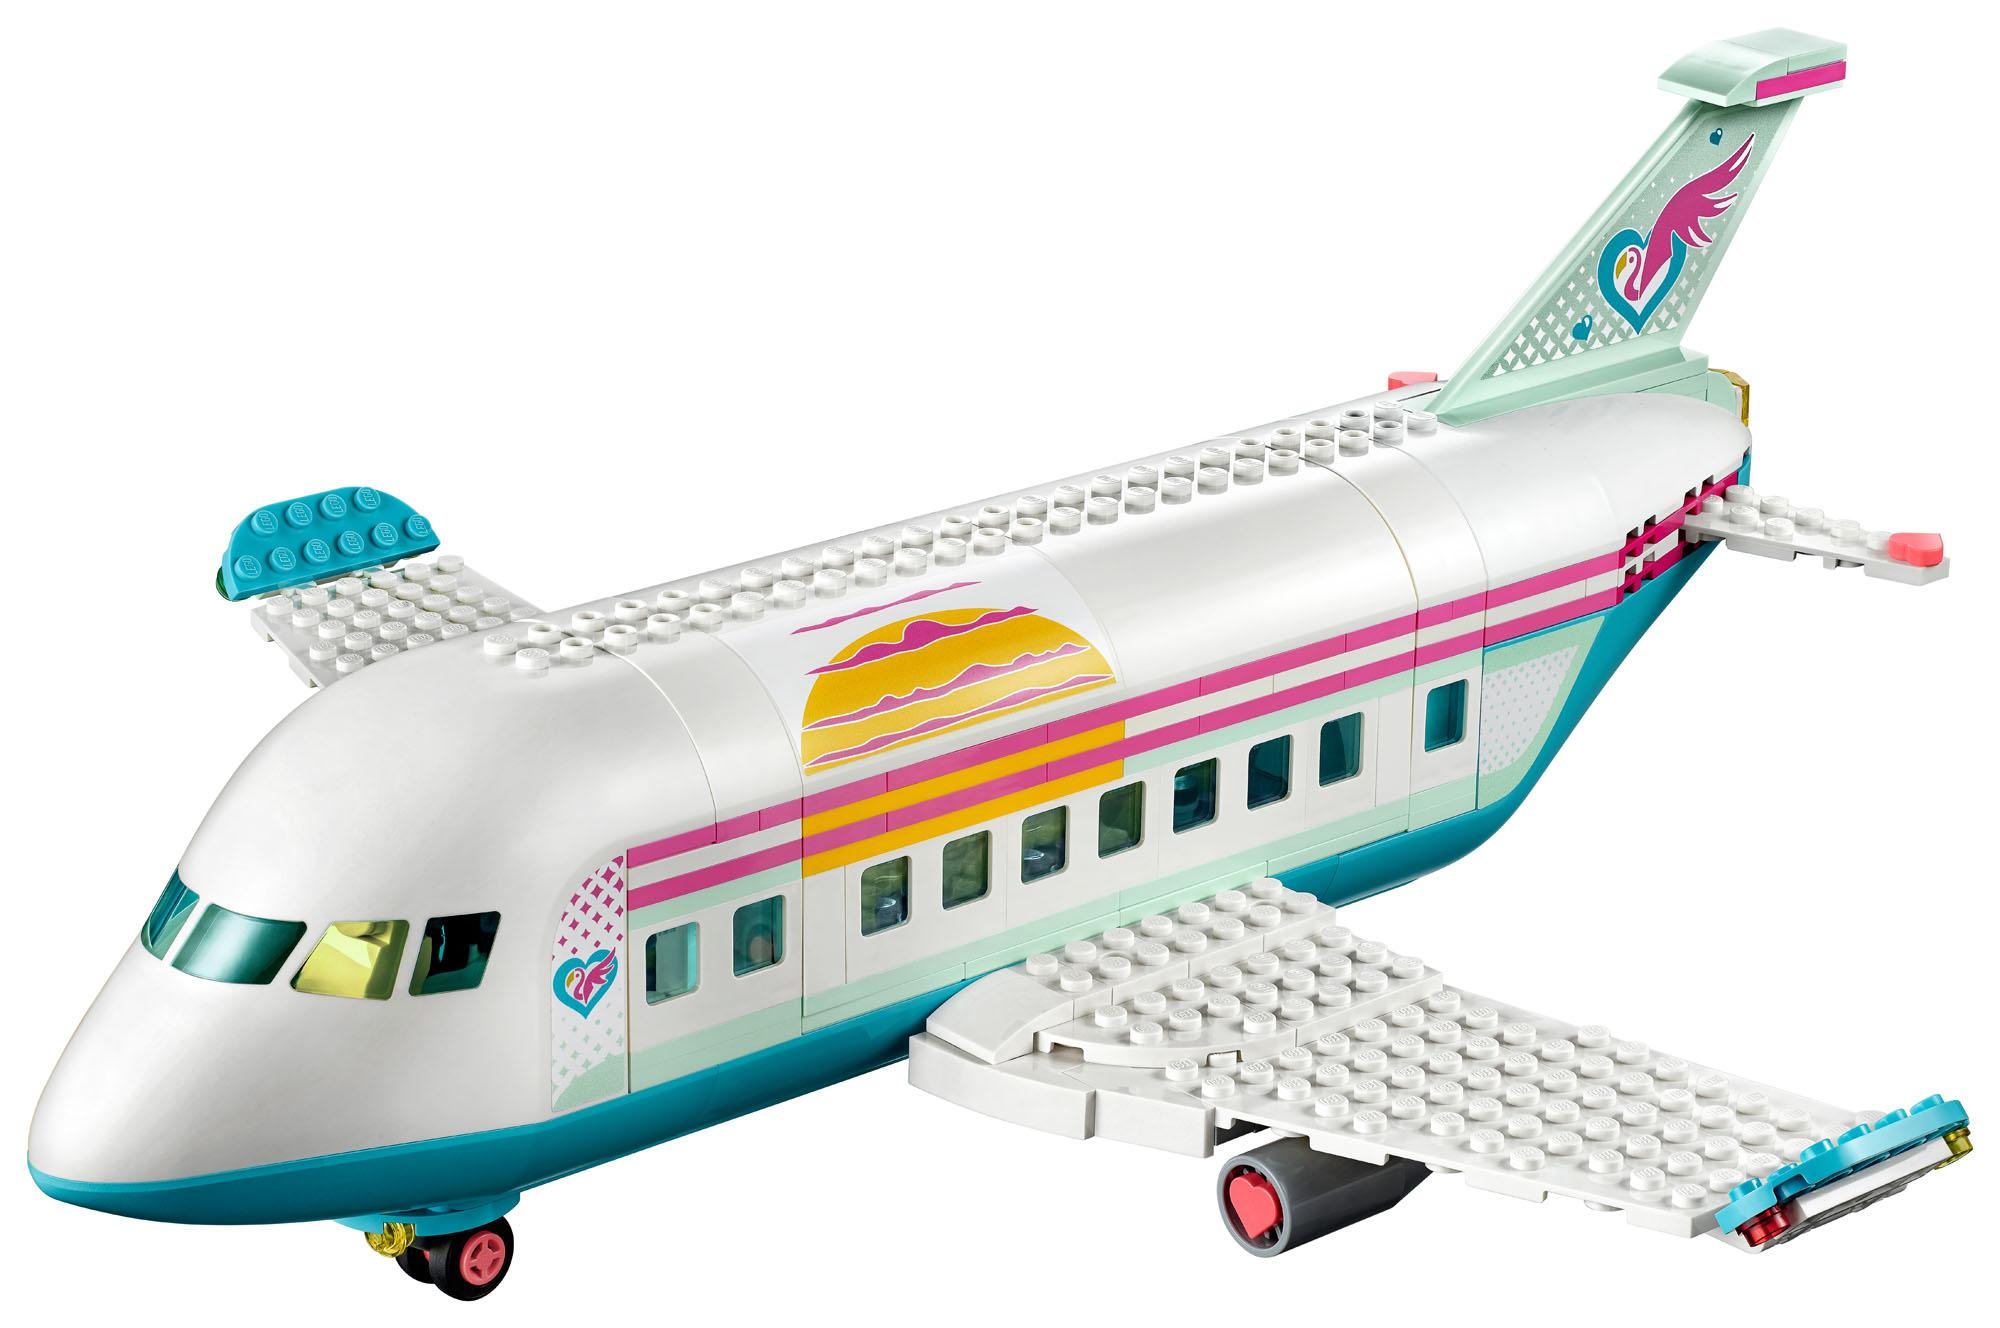 41429 LEGO Friends Heartlake City Airplane Holiday Playset ...